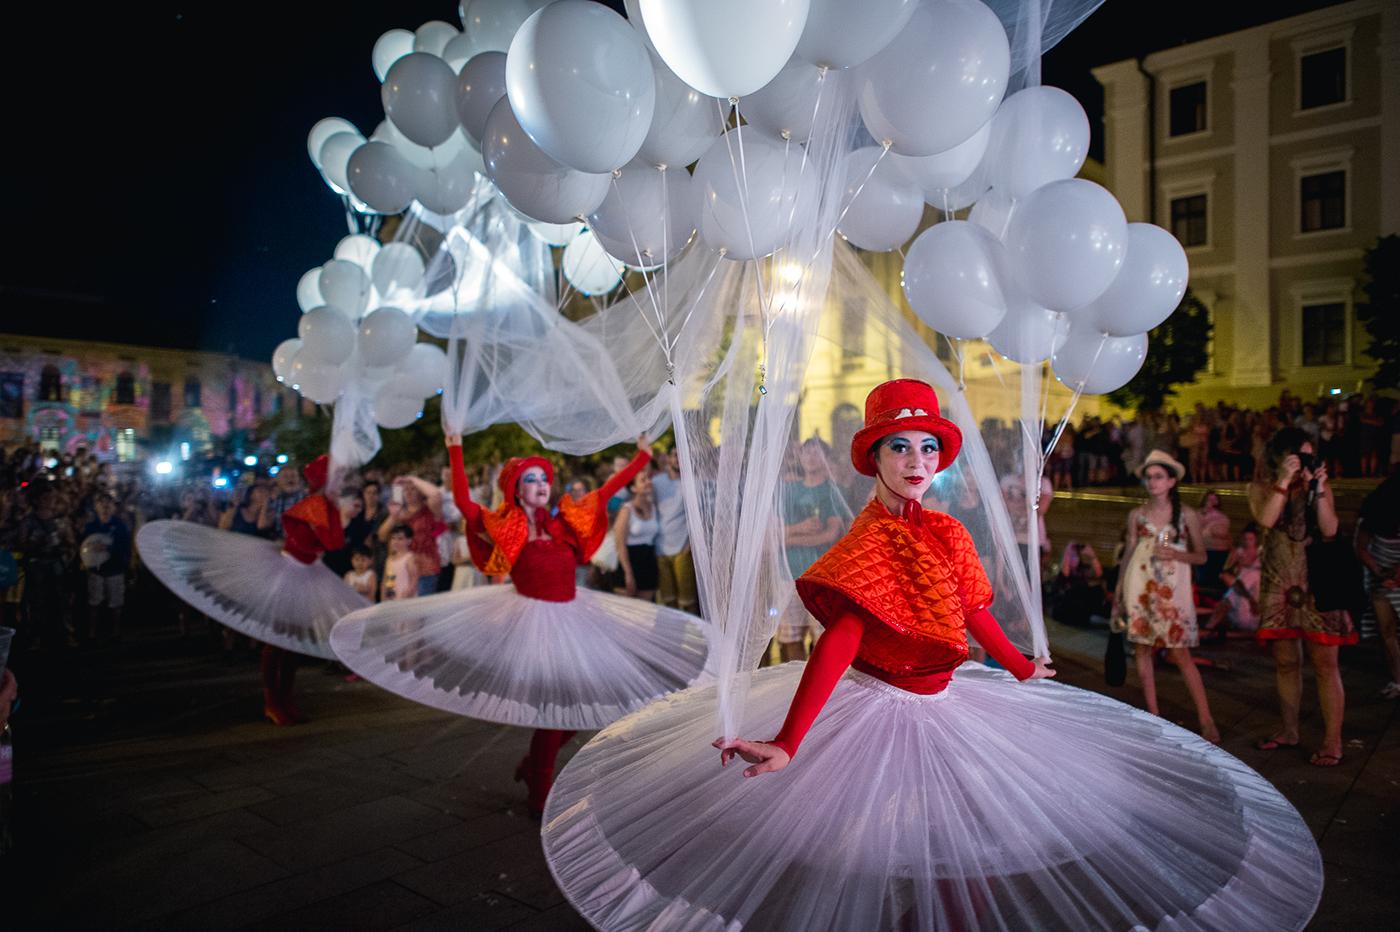 light festival lightfestival art artistic actors cultural balloons Acrobatic